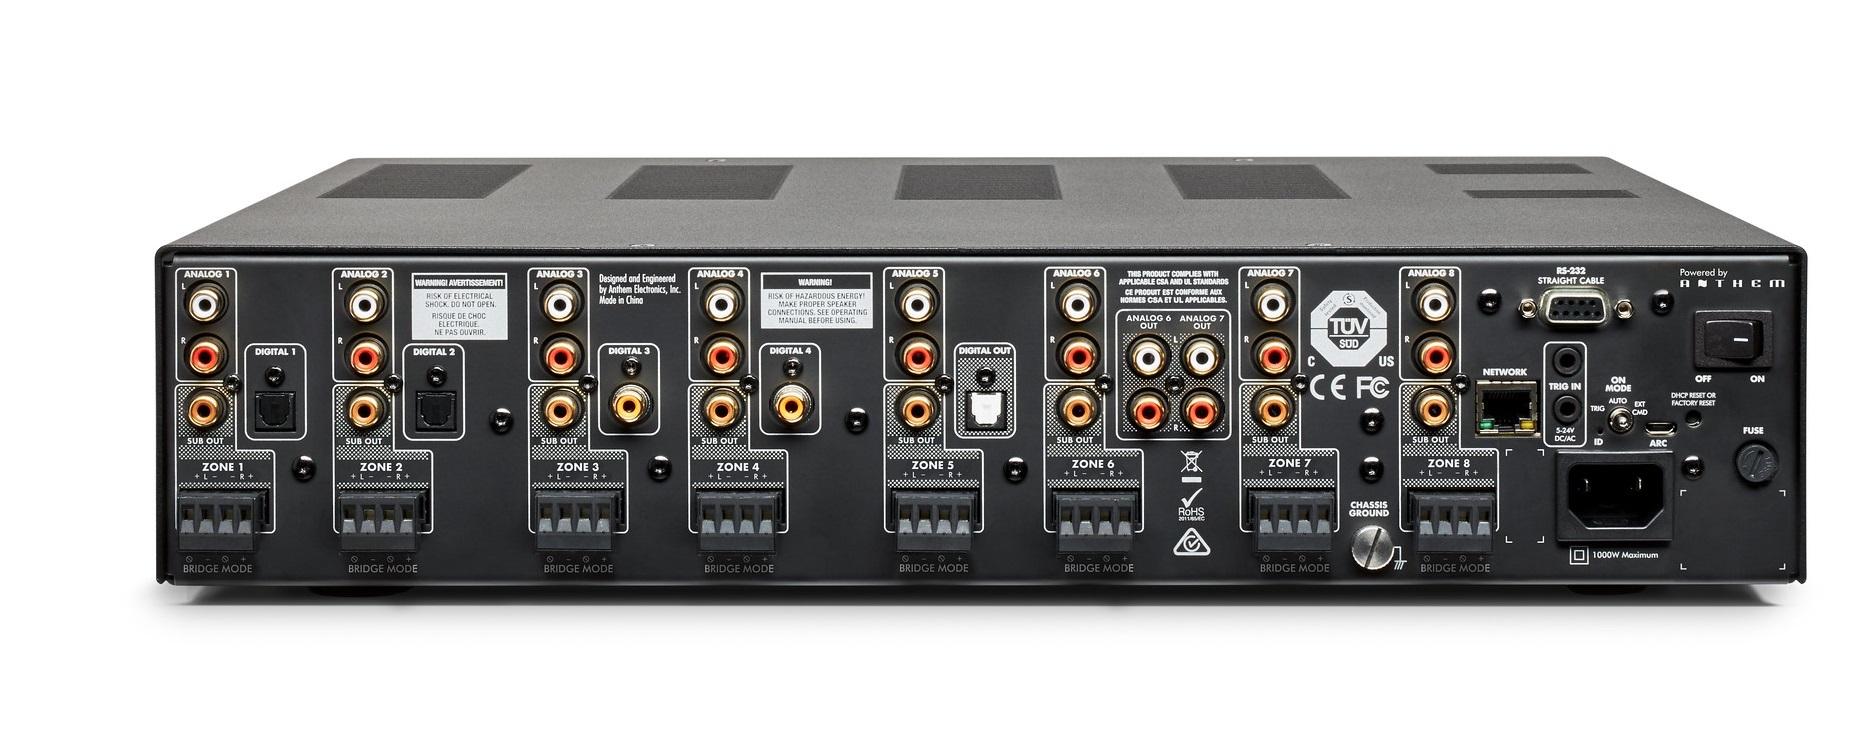 Rear view of Anthem MDX-16 audio distribution system.